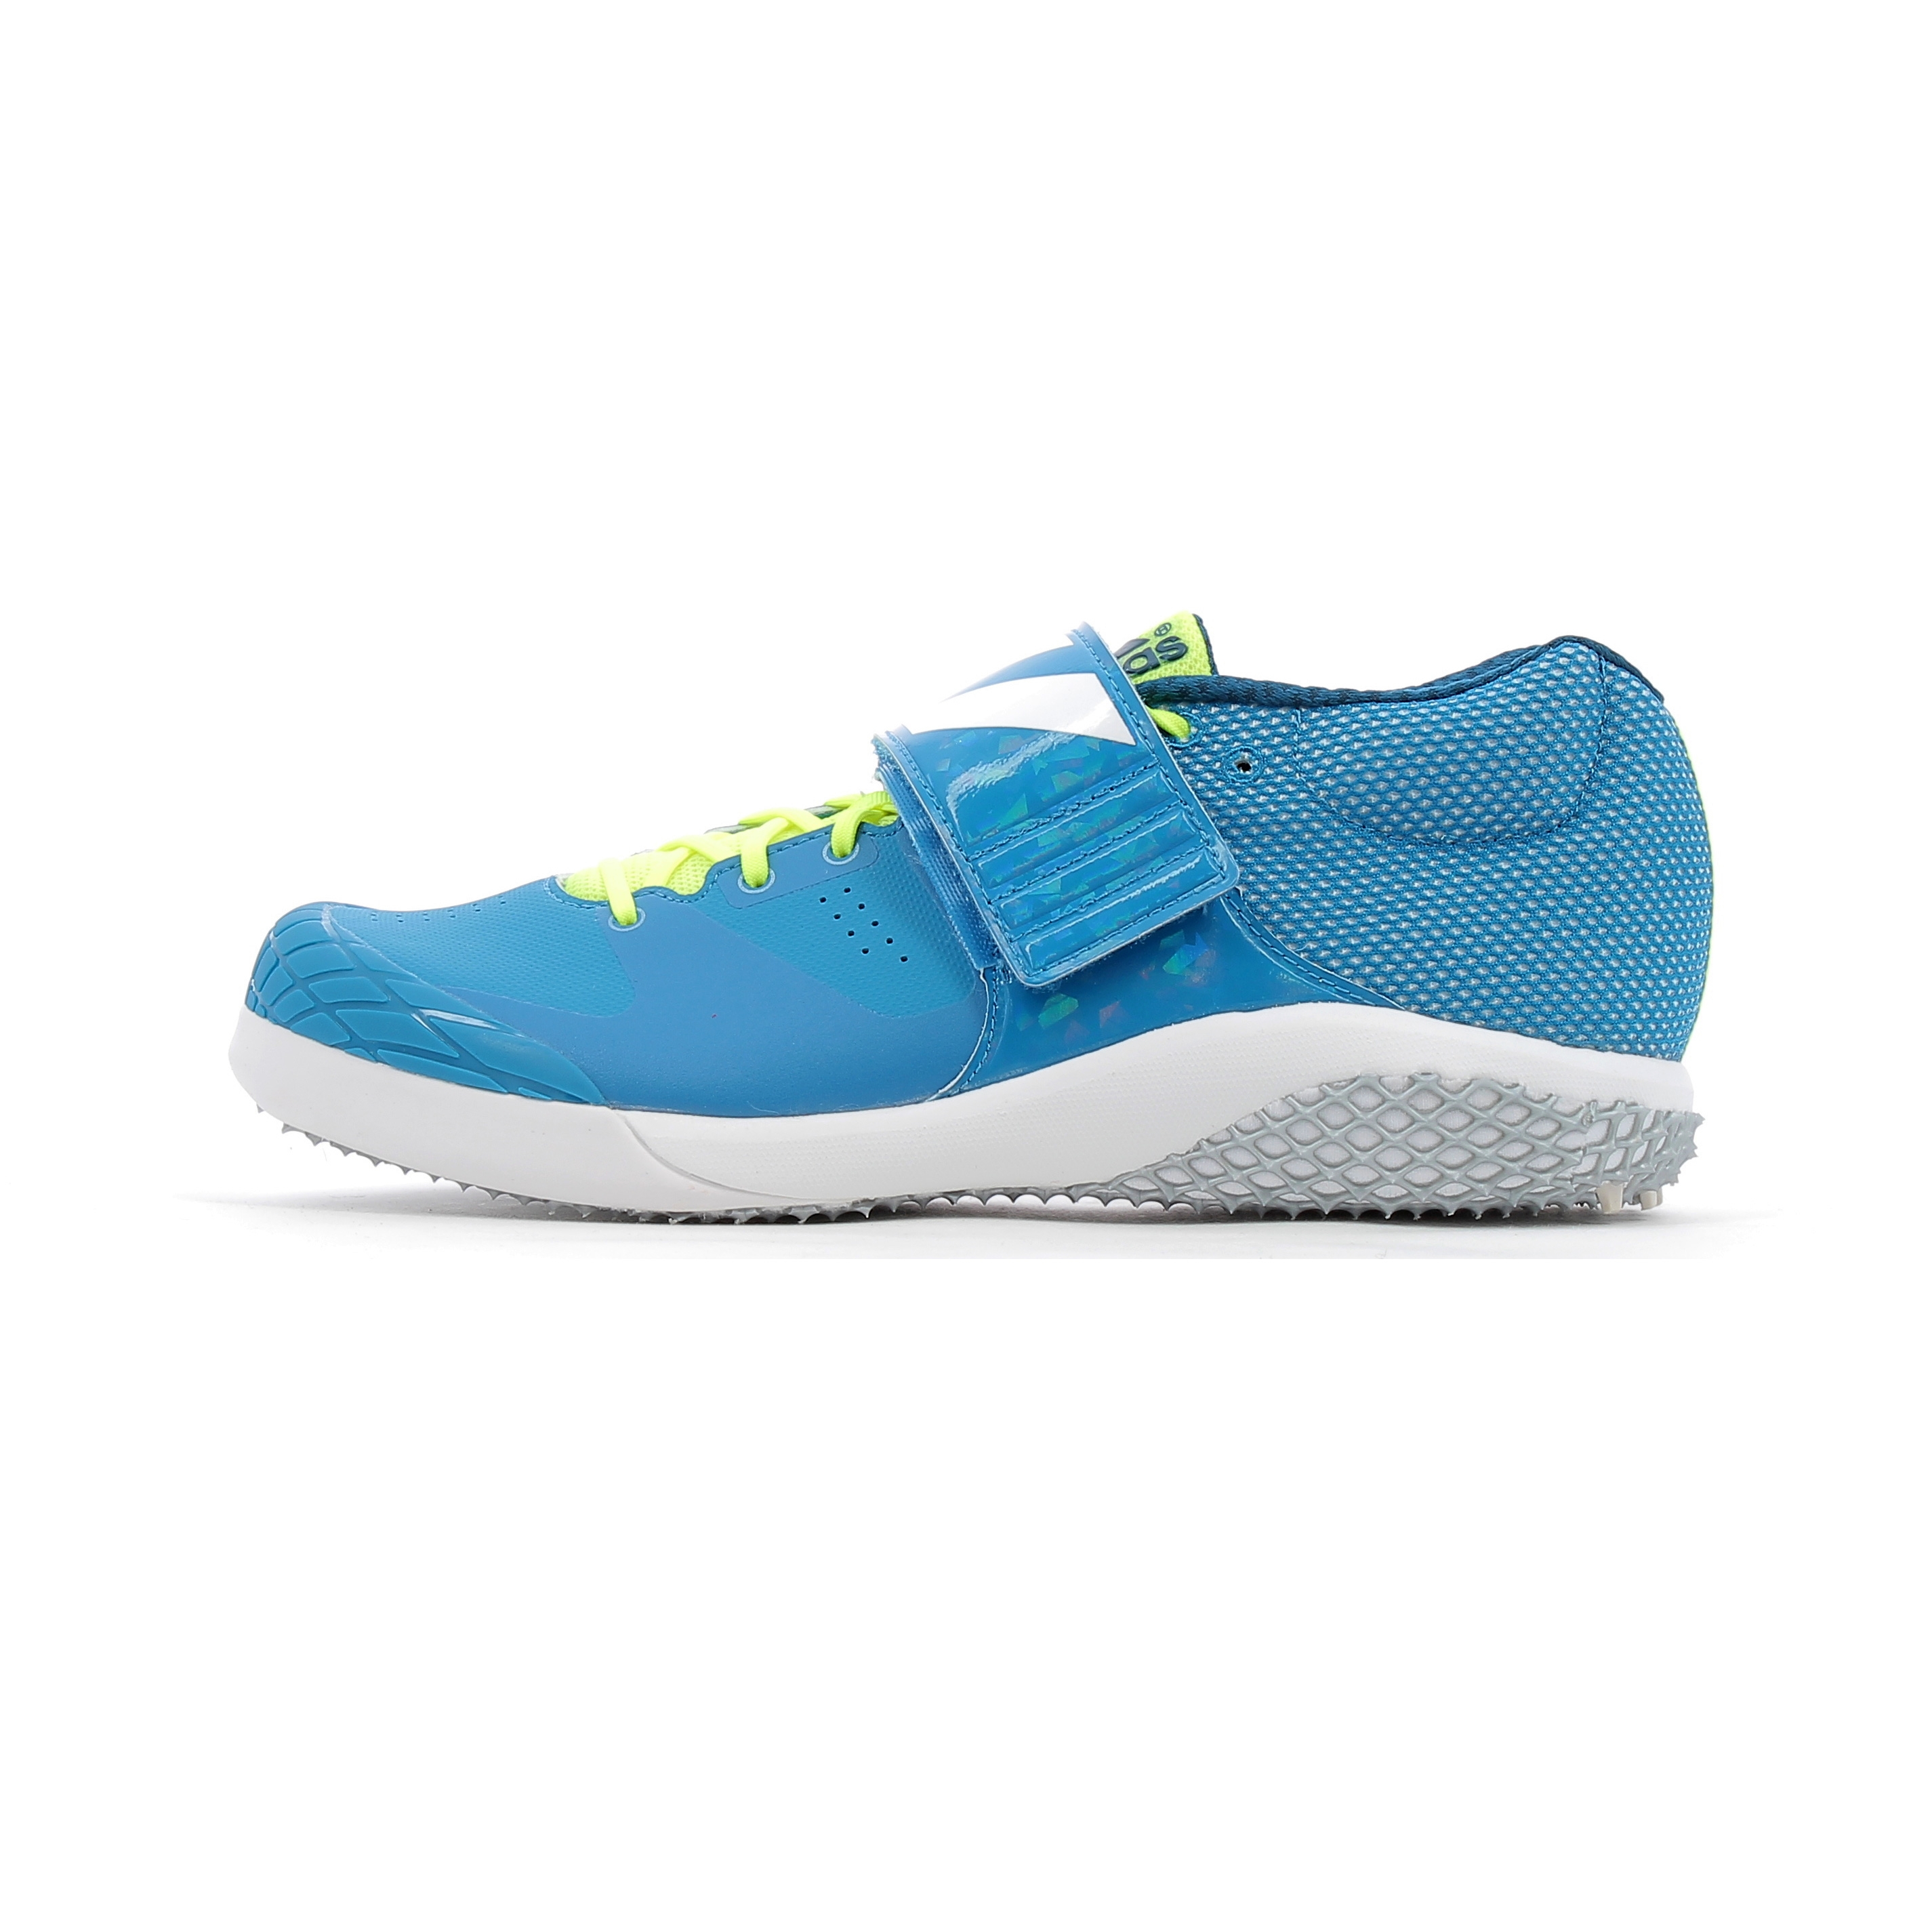 Adizero Adidas Performance Javelin Chaussures D'athlã©tisme jL54AR